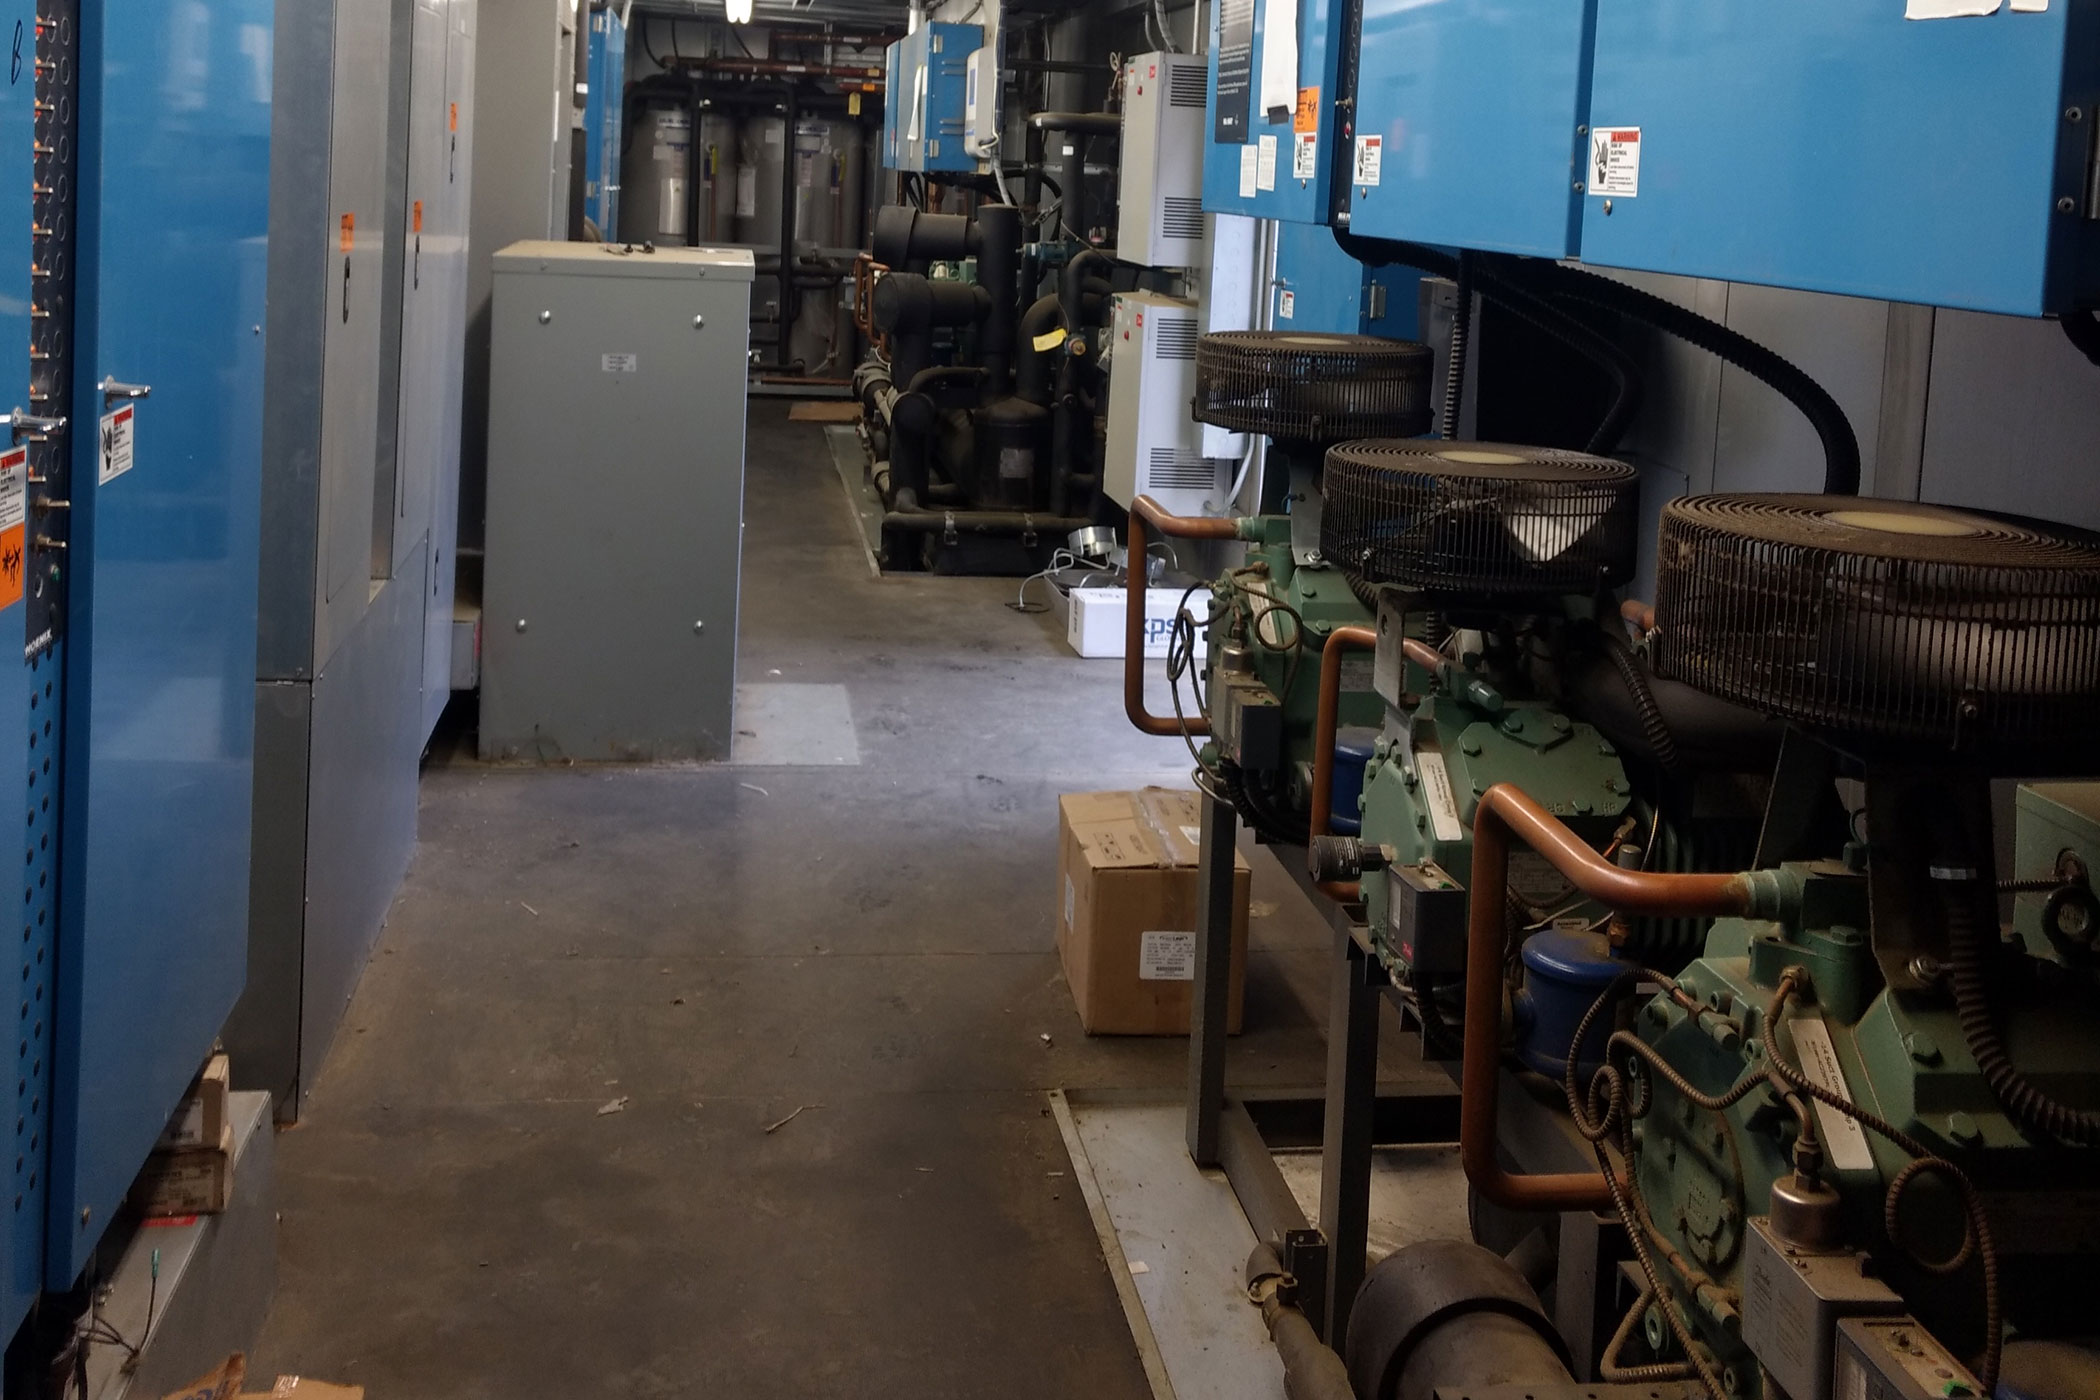 Hvac Repair Amp Service Red Bank Nj Able Mechanical Inc